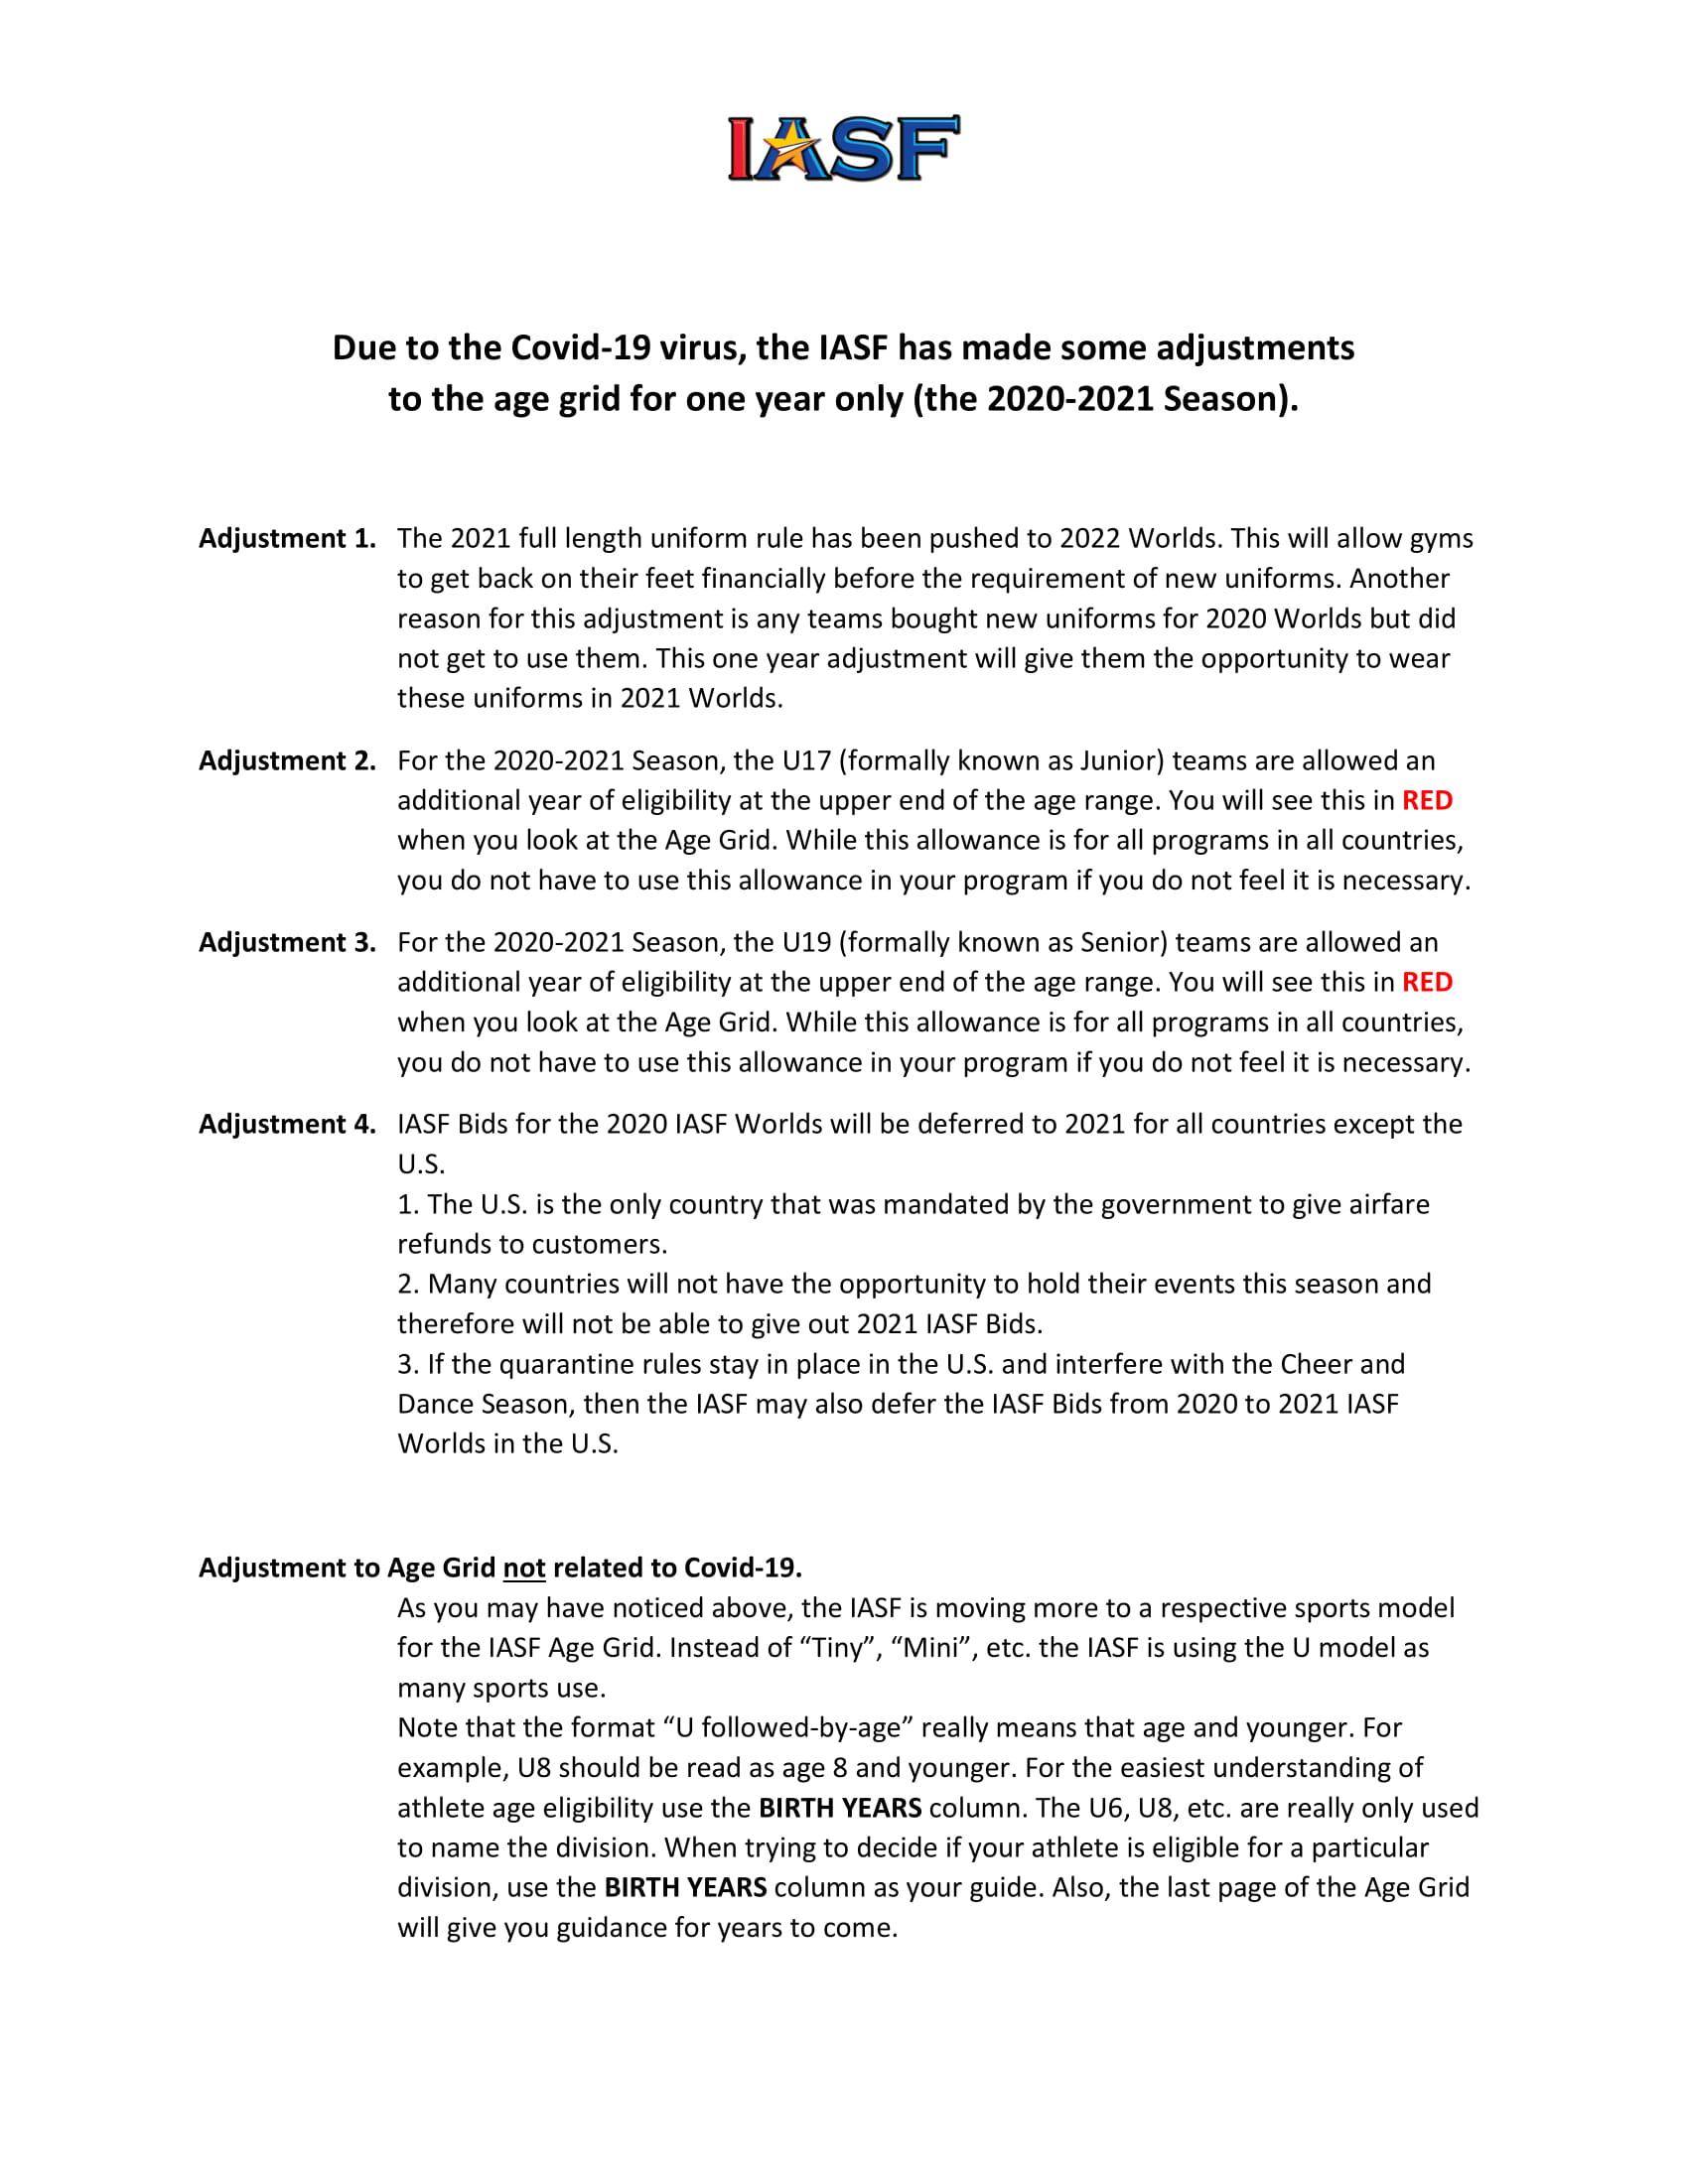 cheerleading organization IASF changes for 2020-2021 international cheerleading worlds